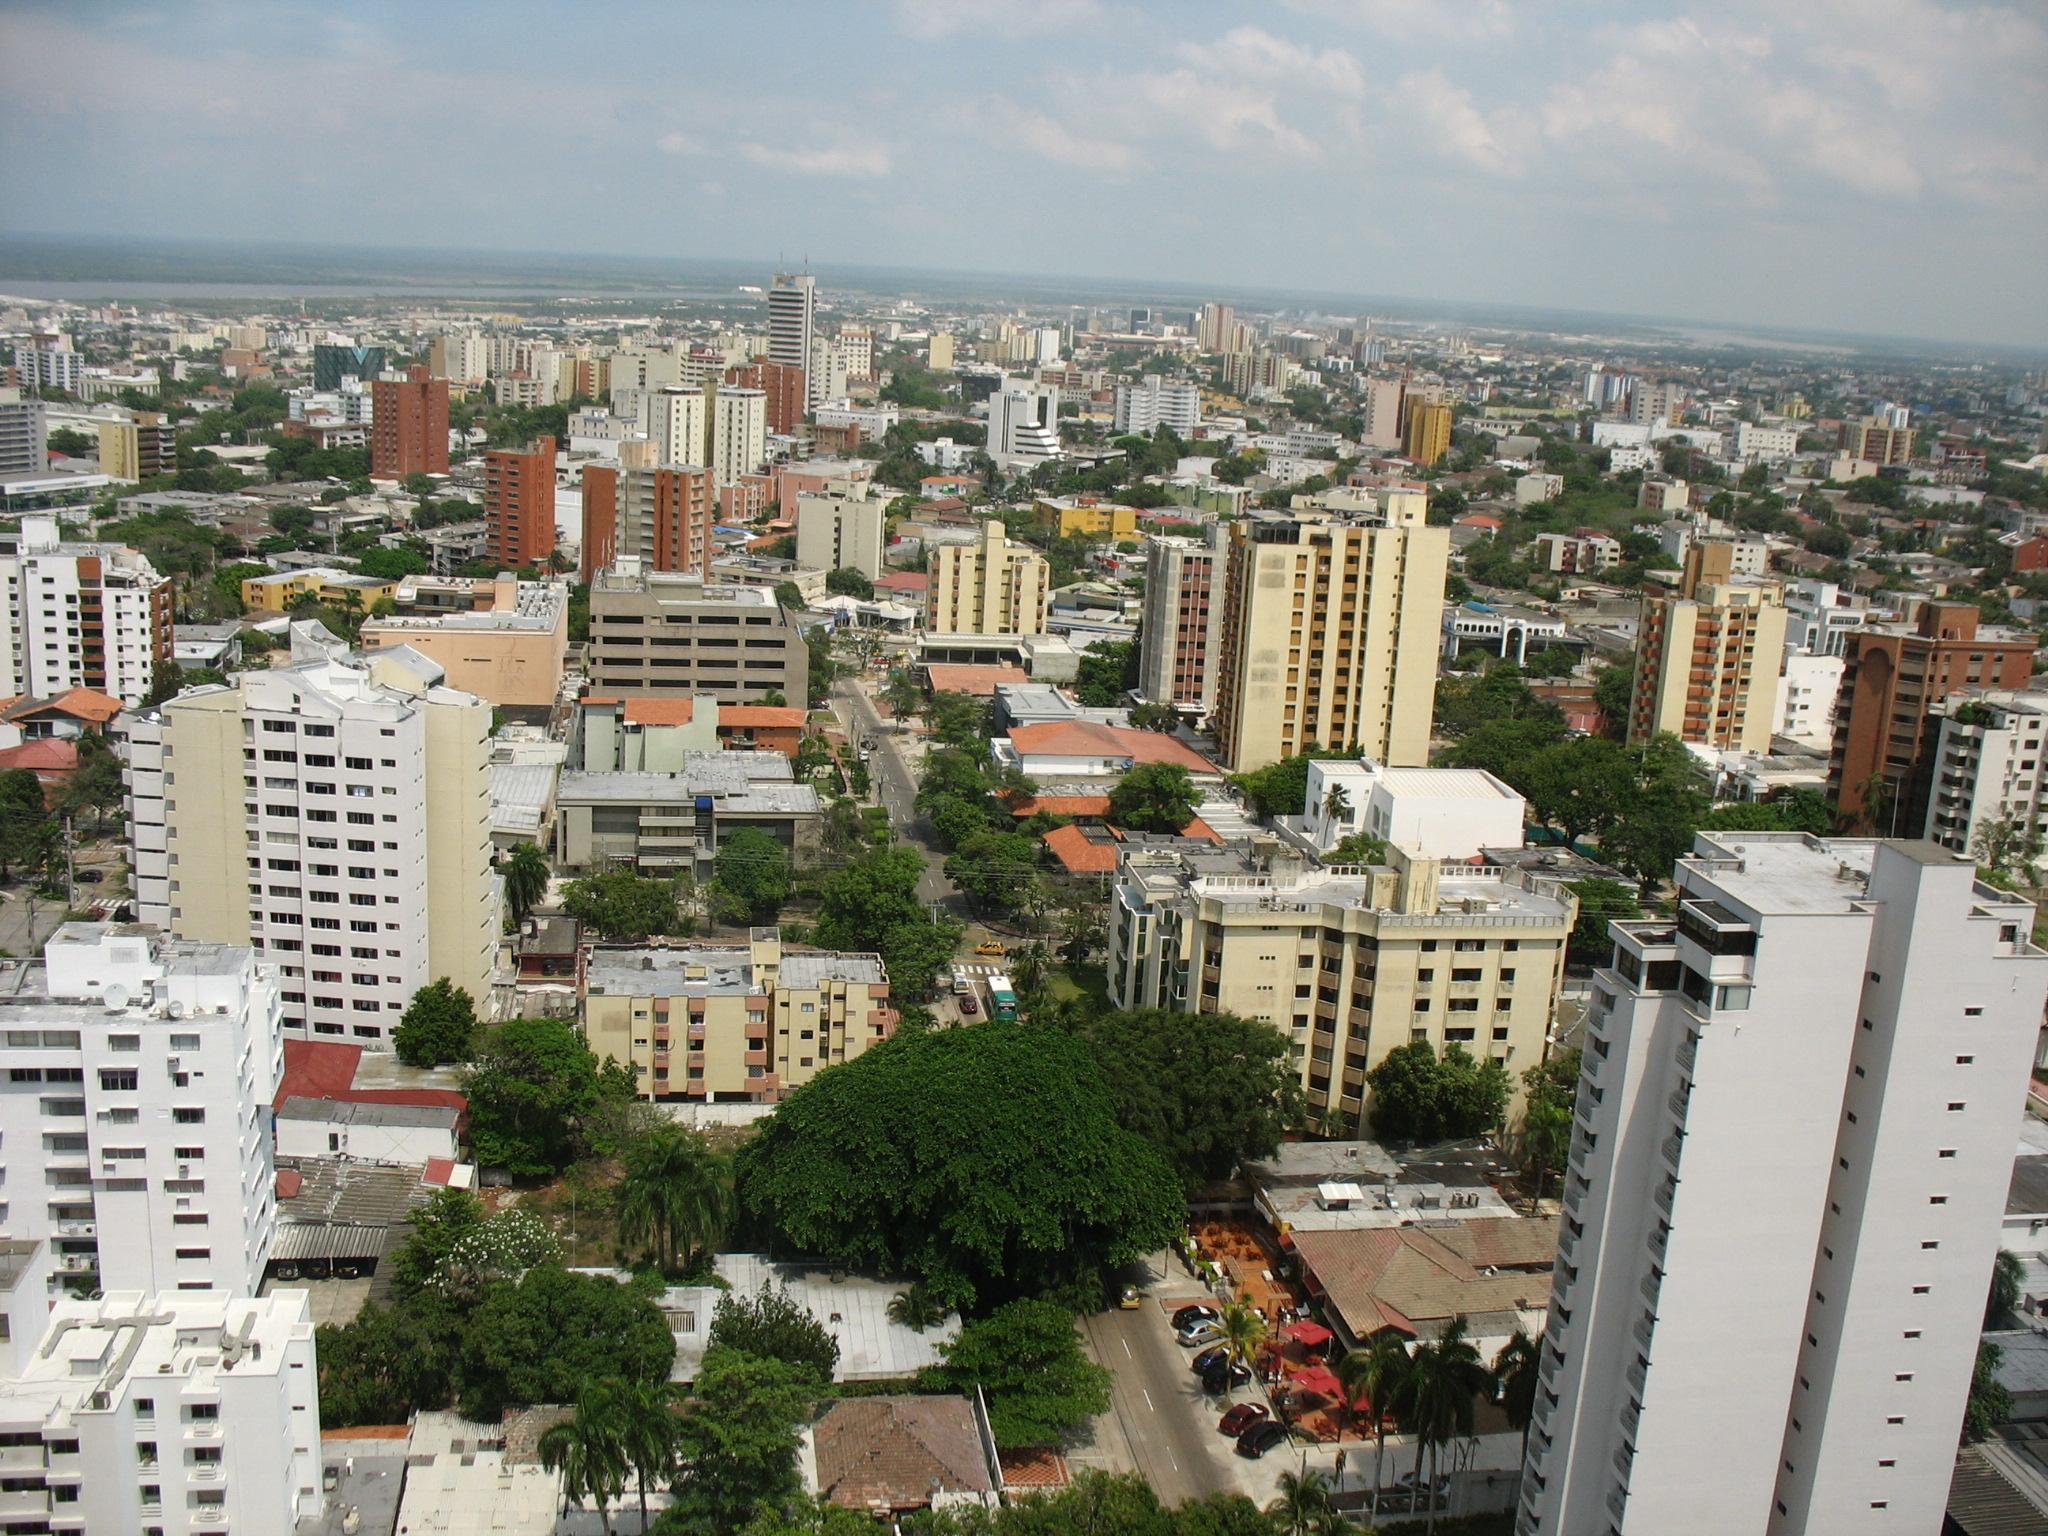 File:Panorámica general de Barranquilla.JPG - Wikimedia Commons